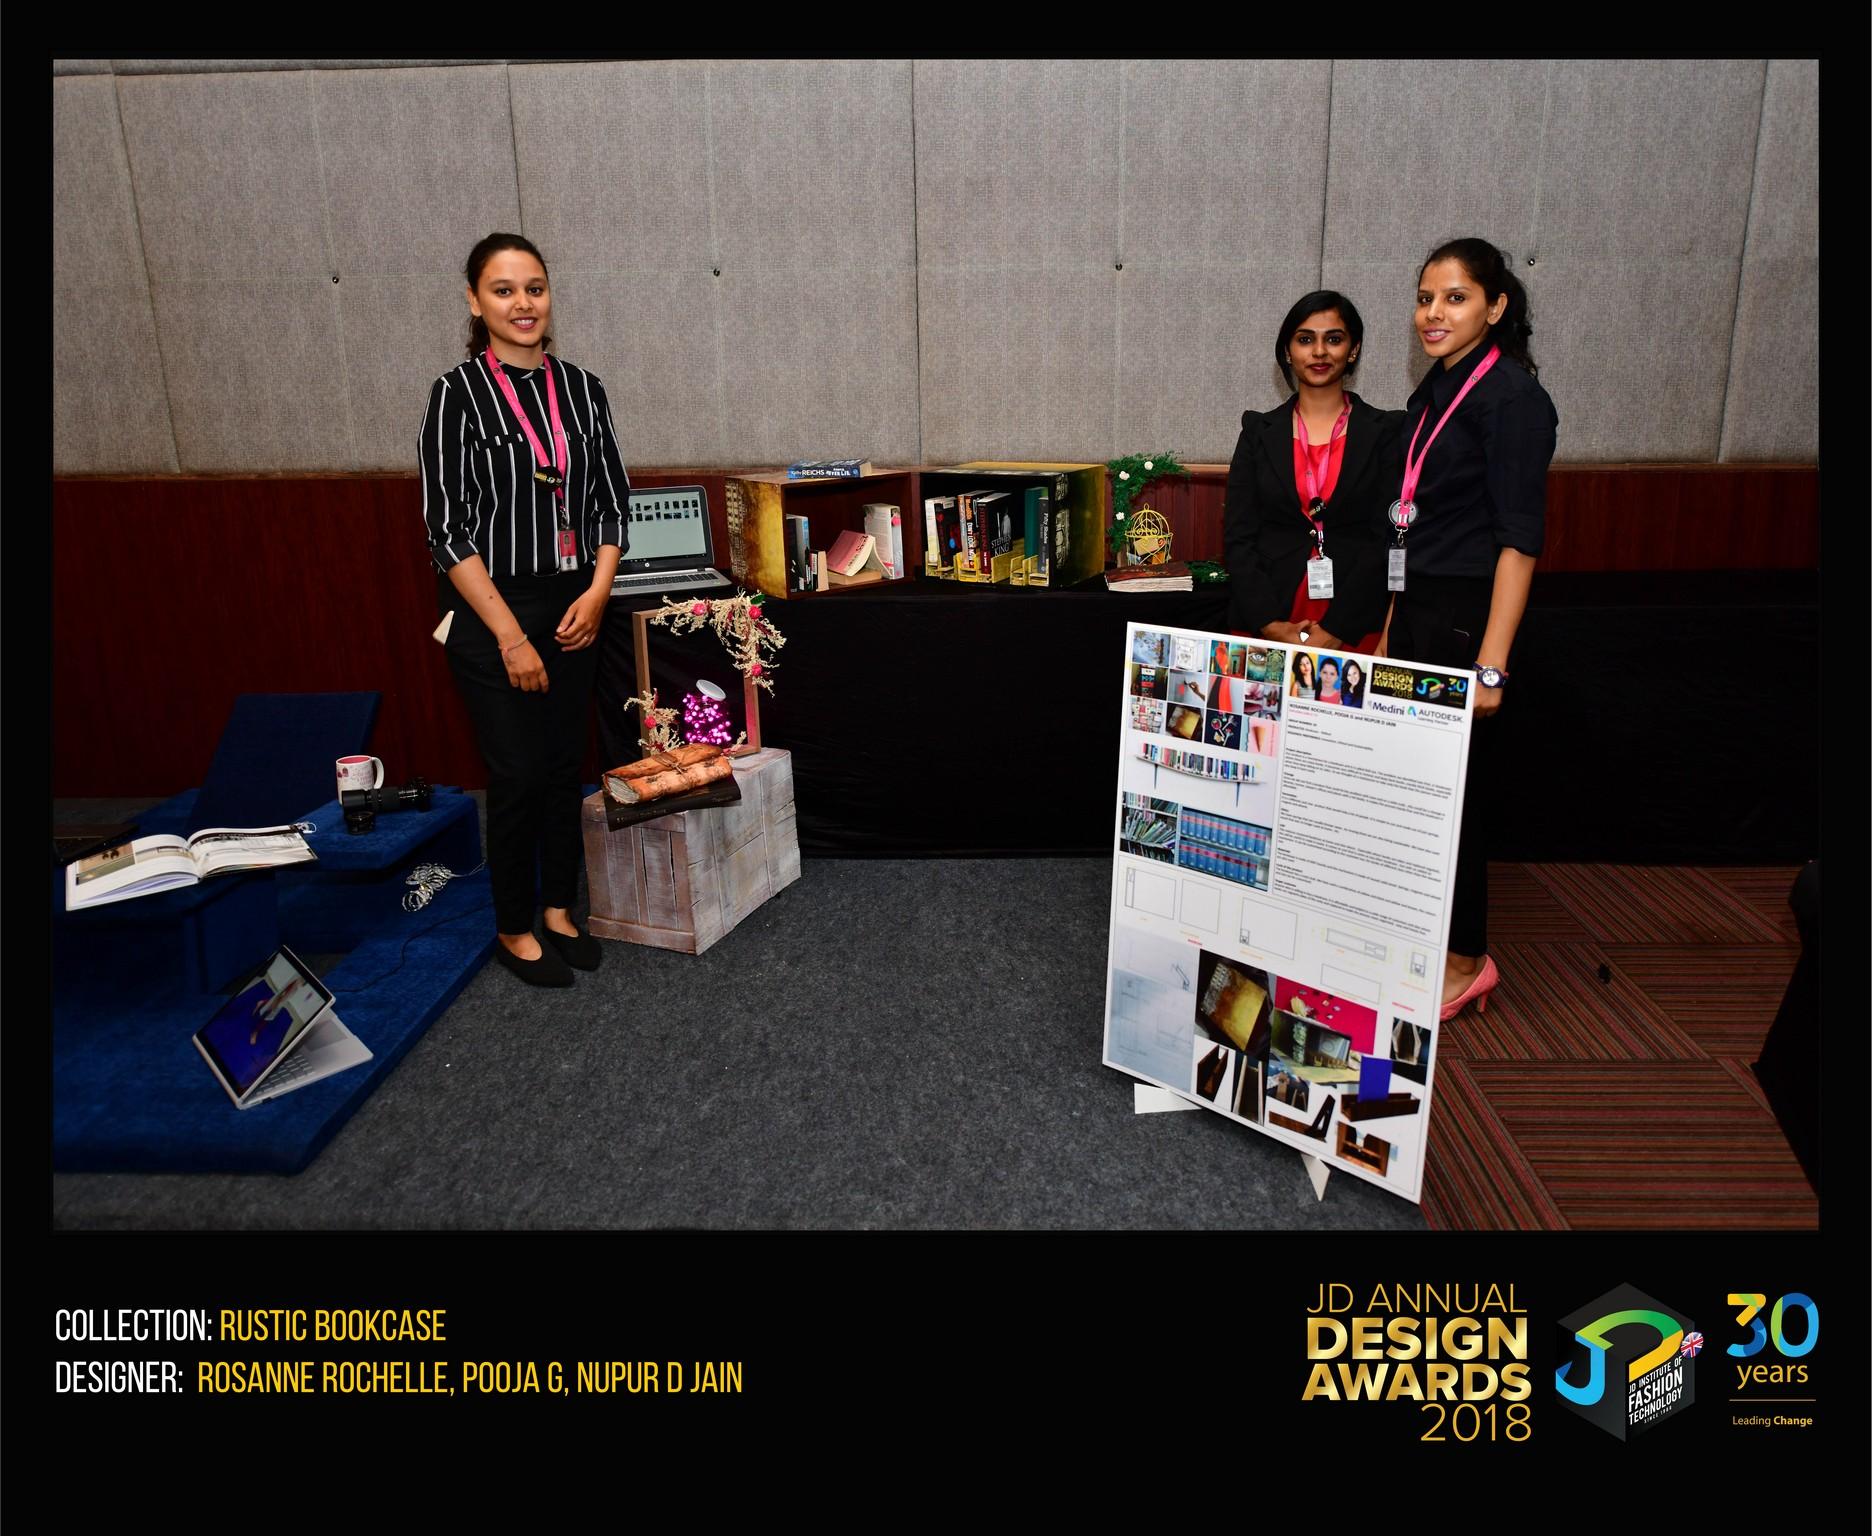 rustic bookcase - rustic bookcase - Rustic Bookcase– Change – JD Annual Design Awards 2018